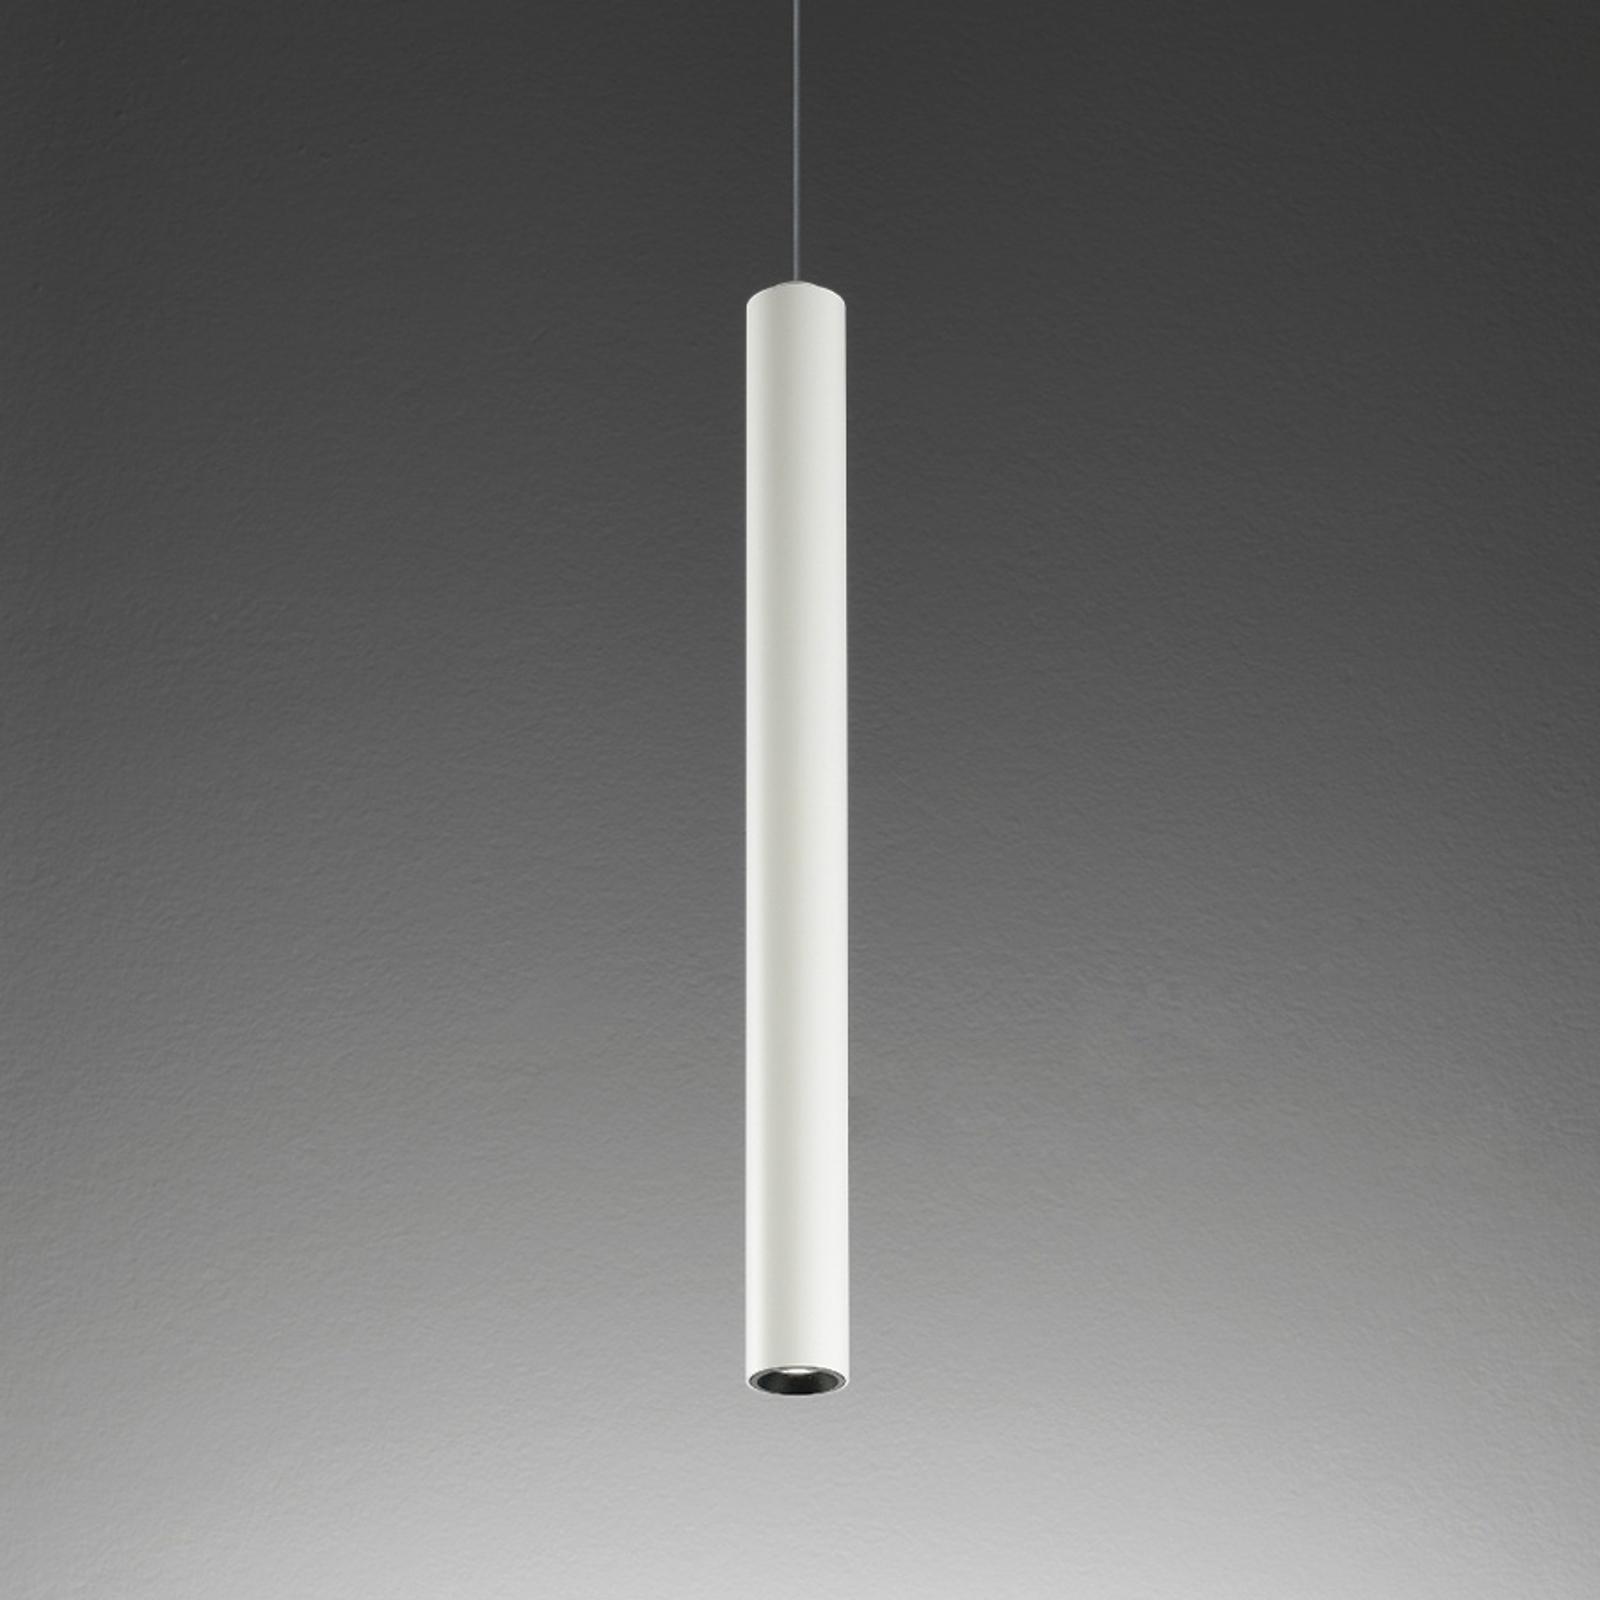 Tehokas LED-riippuvalaisin Lilli